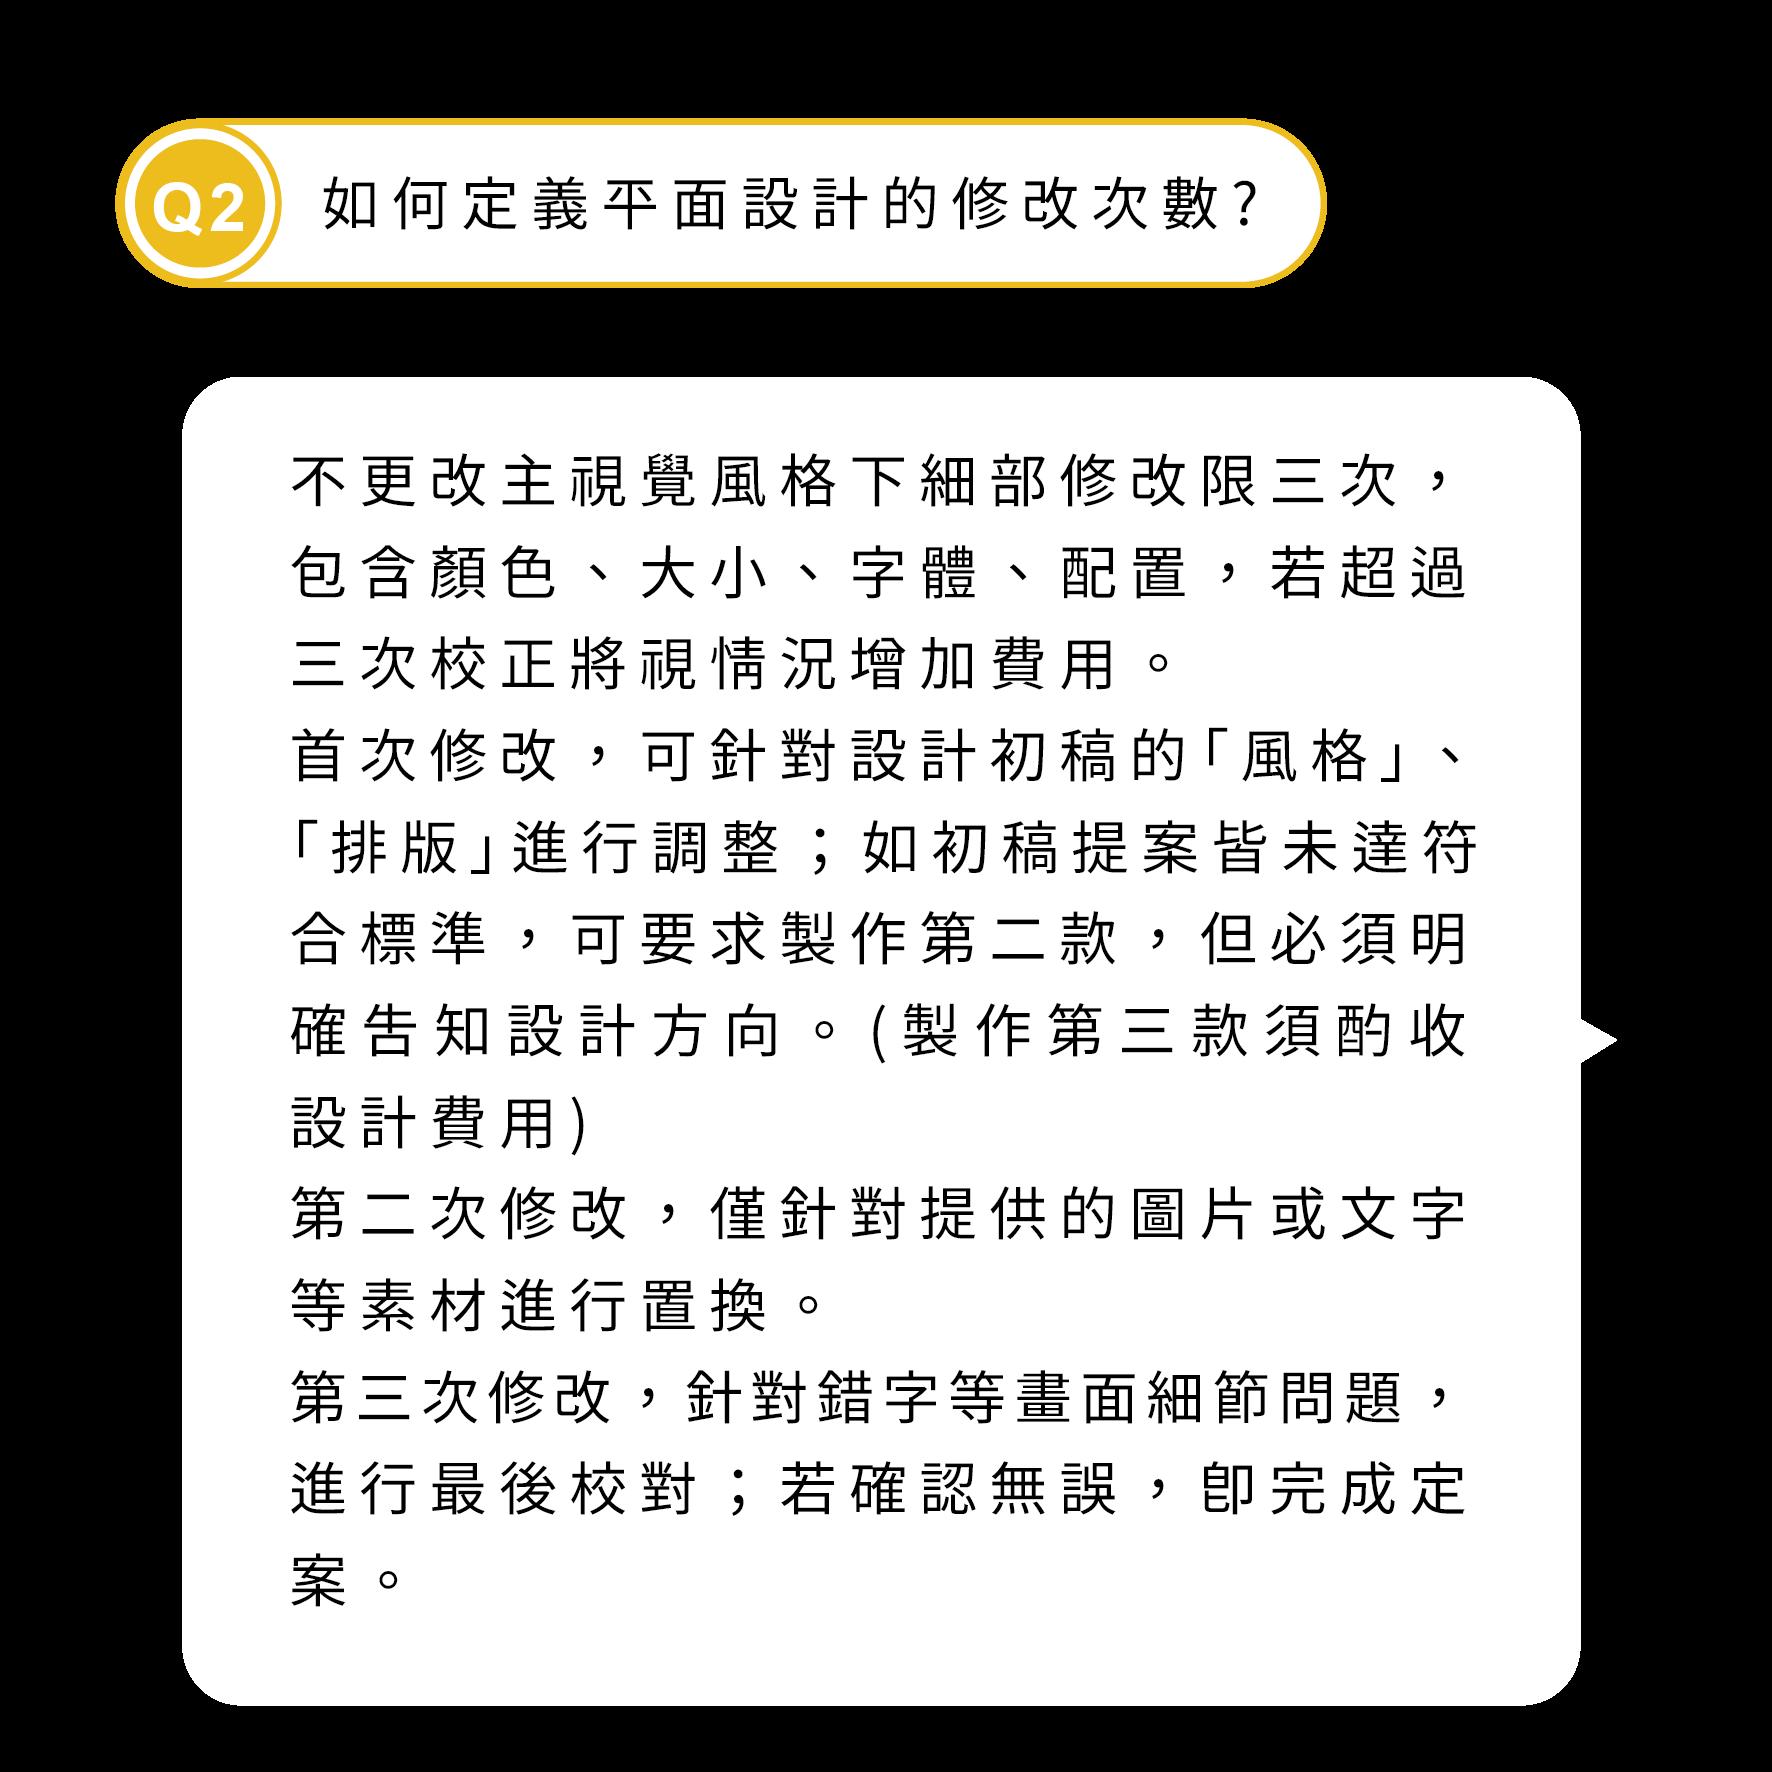 Q2-11